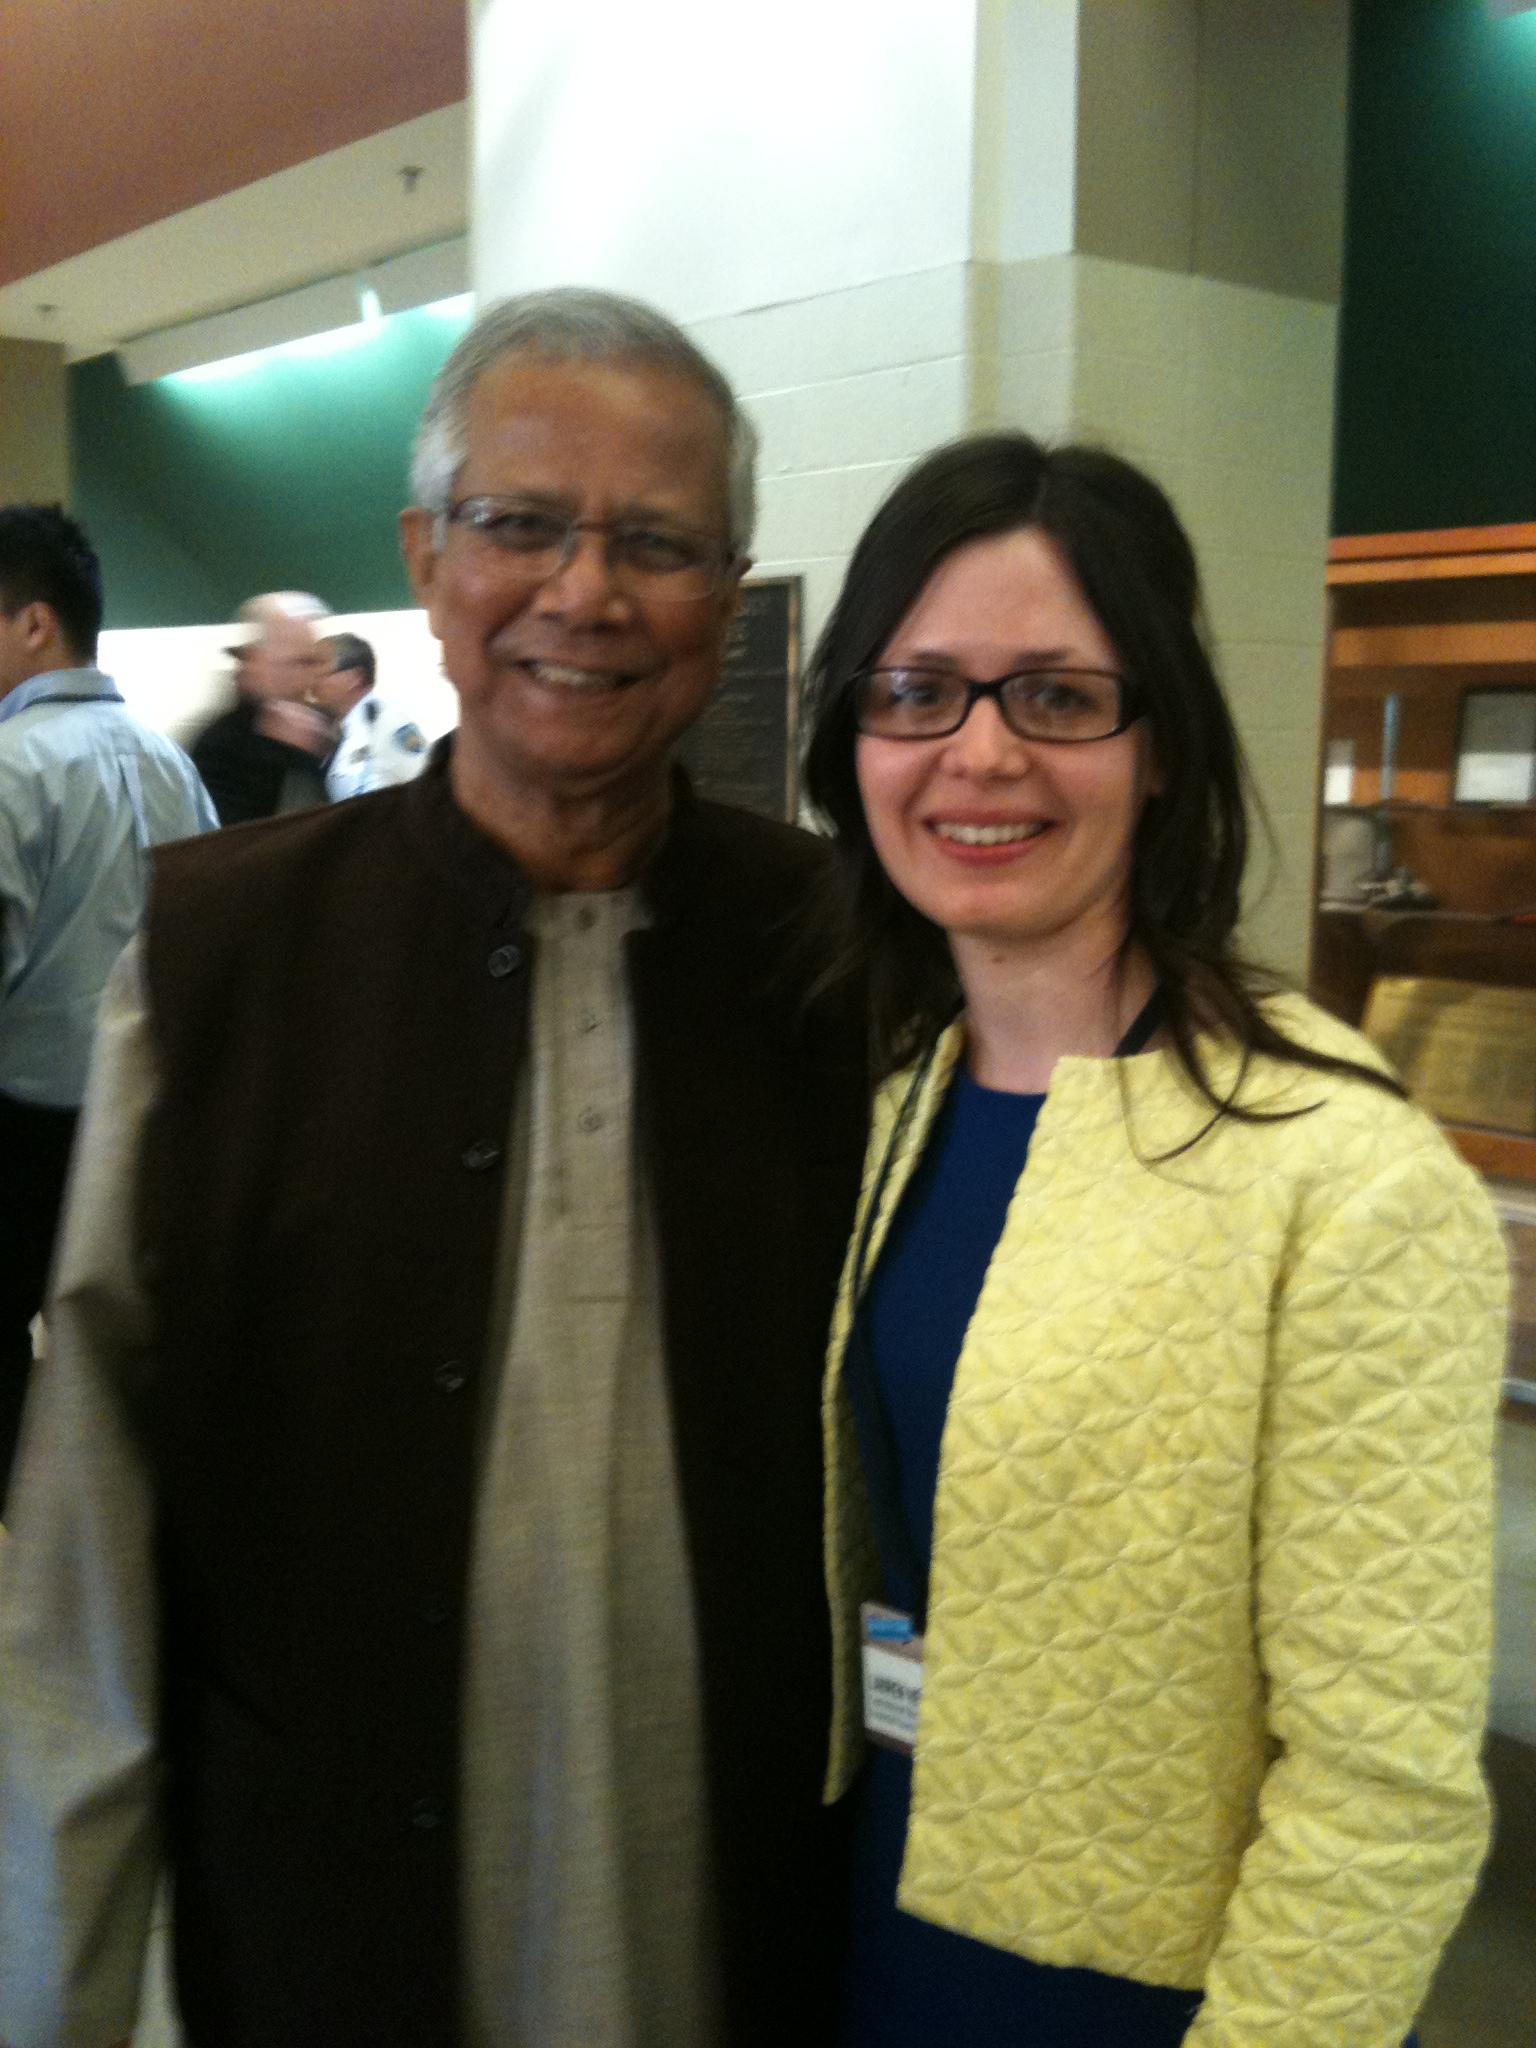 Lauren Herman and Mohammad Yunus. Yunus is the founding pioneer of microcredit.